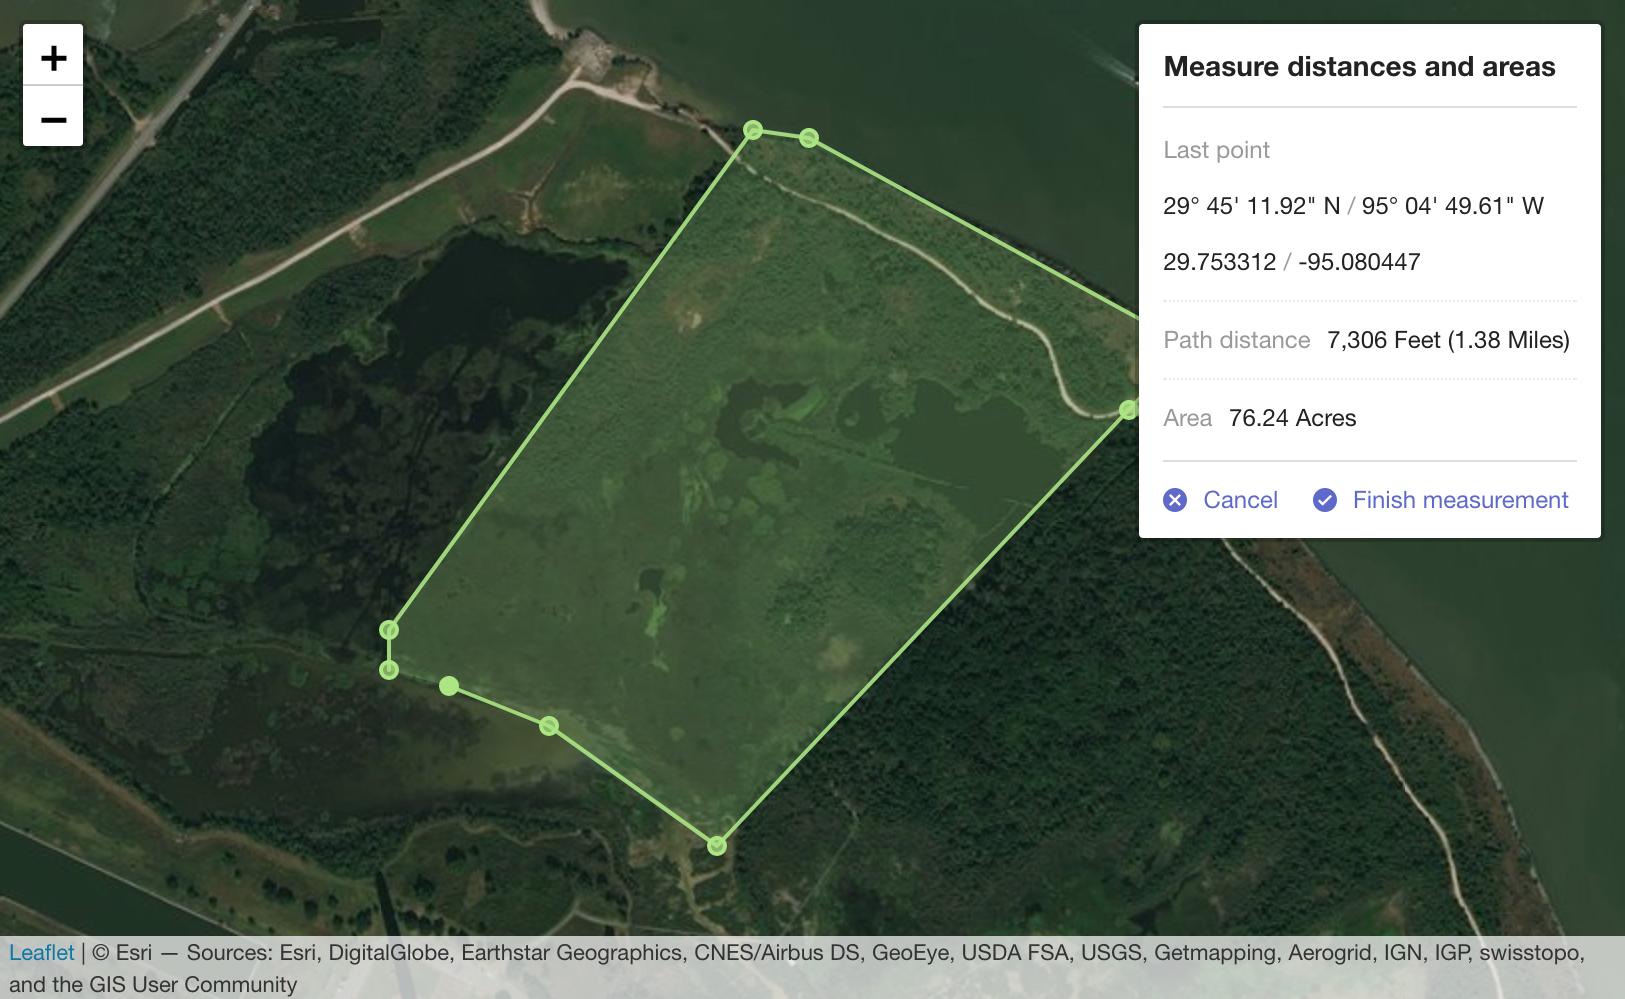 GitHub - ljagis/leaflet-measure: Coordinate, linear, and area